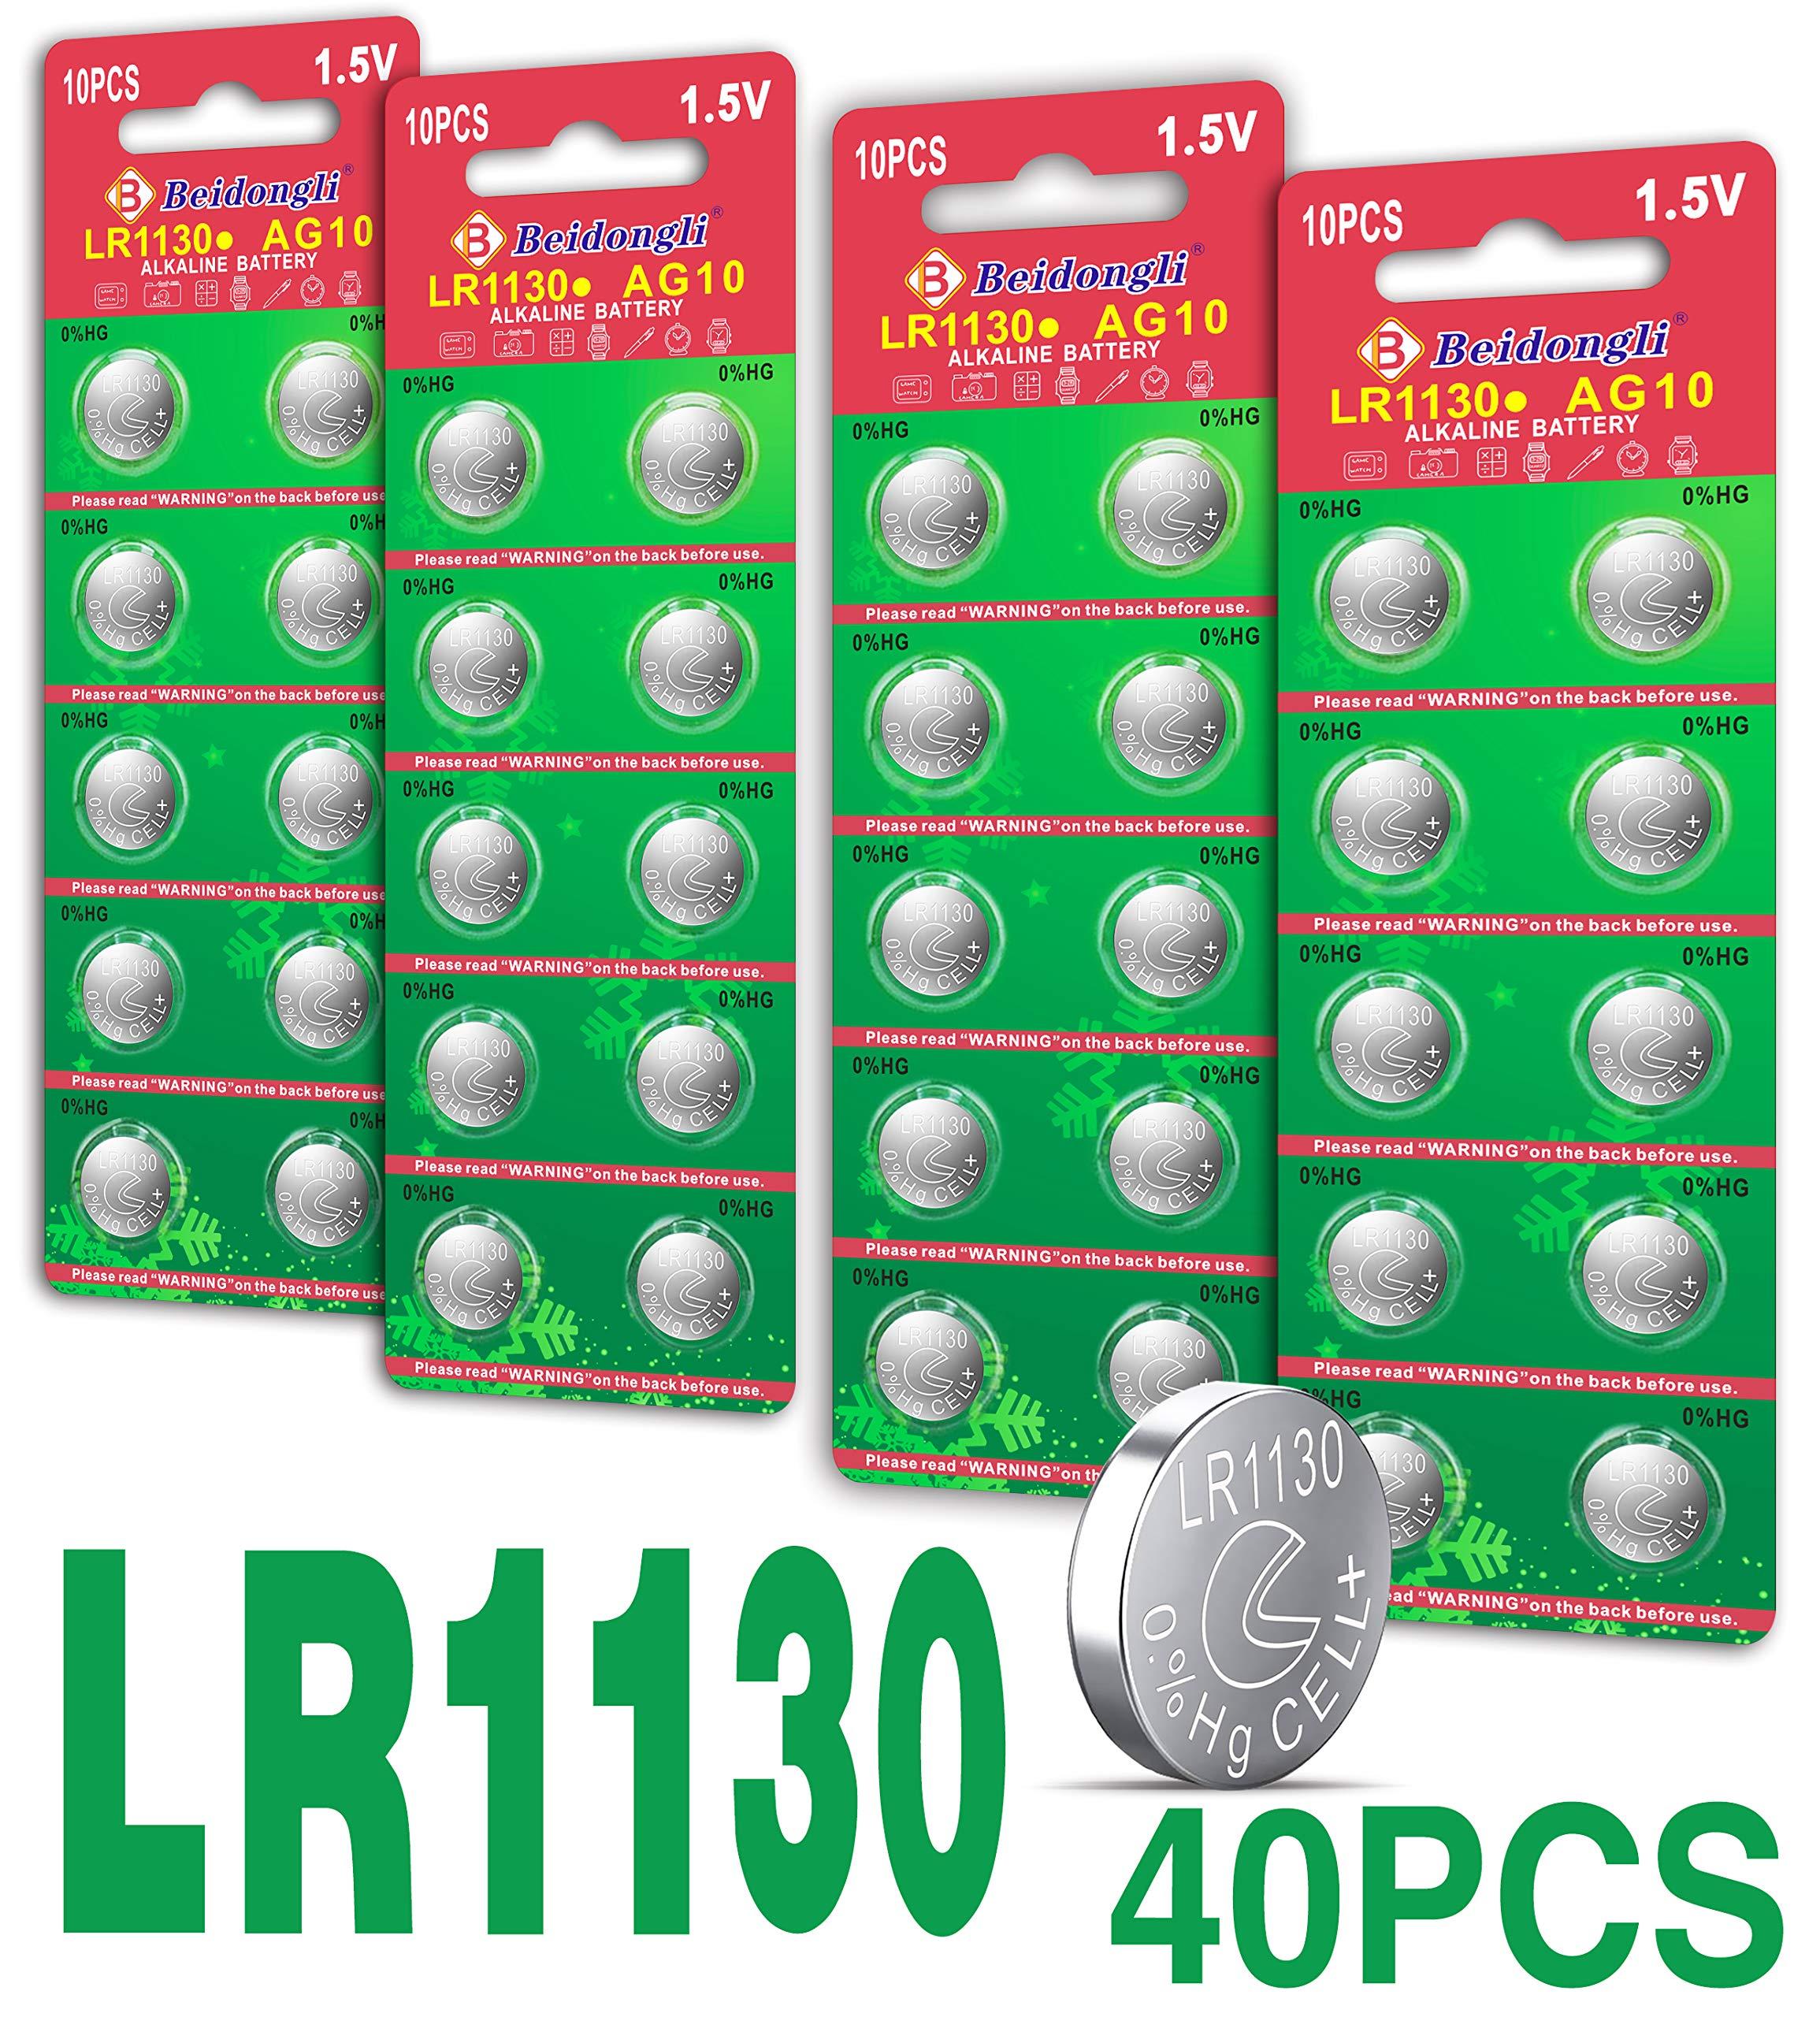 Beidongli AG10 LR1130, LR54, LR54, AG10 Battery 1.5V Button Coin Cell Batteries New (40 Pack)